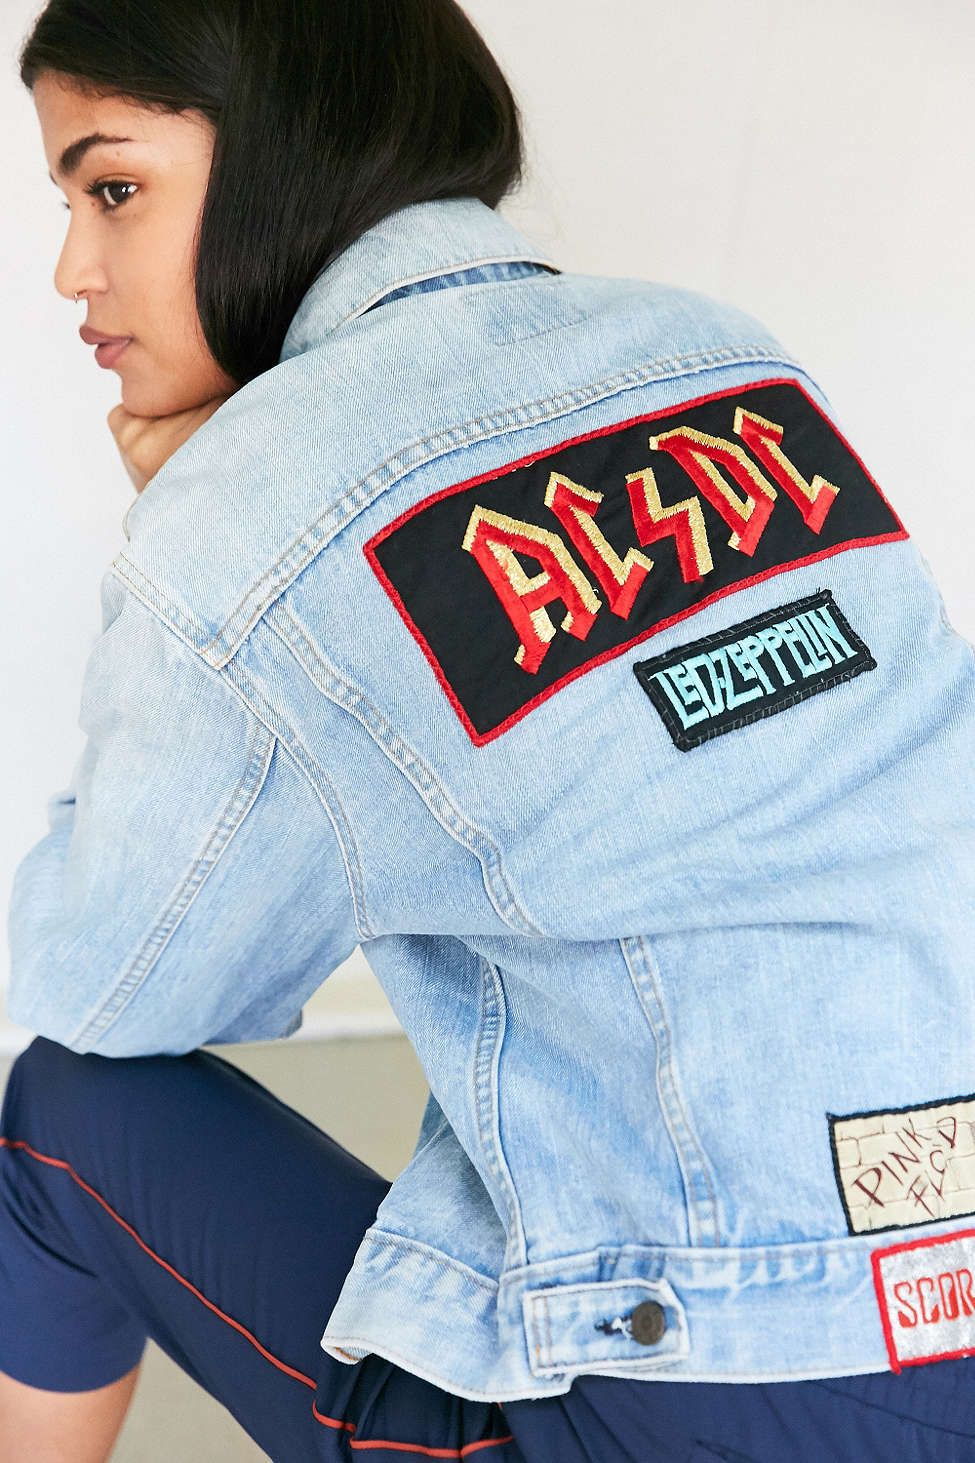 Vintage Band Patch Denim Jacket | Denim jacket patches